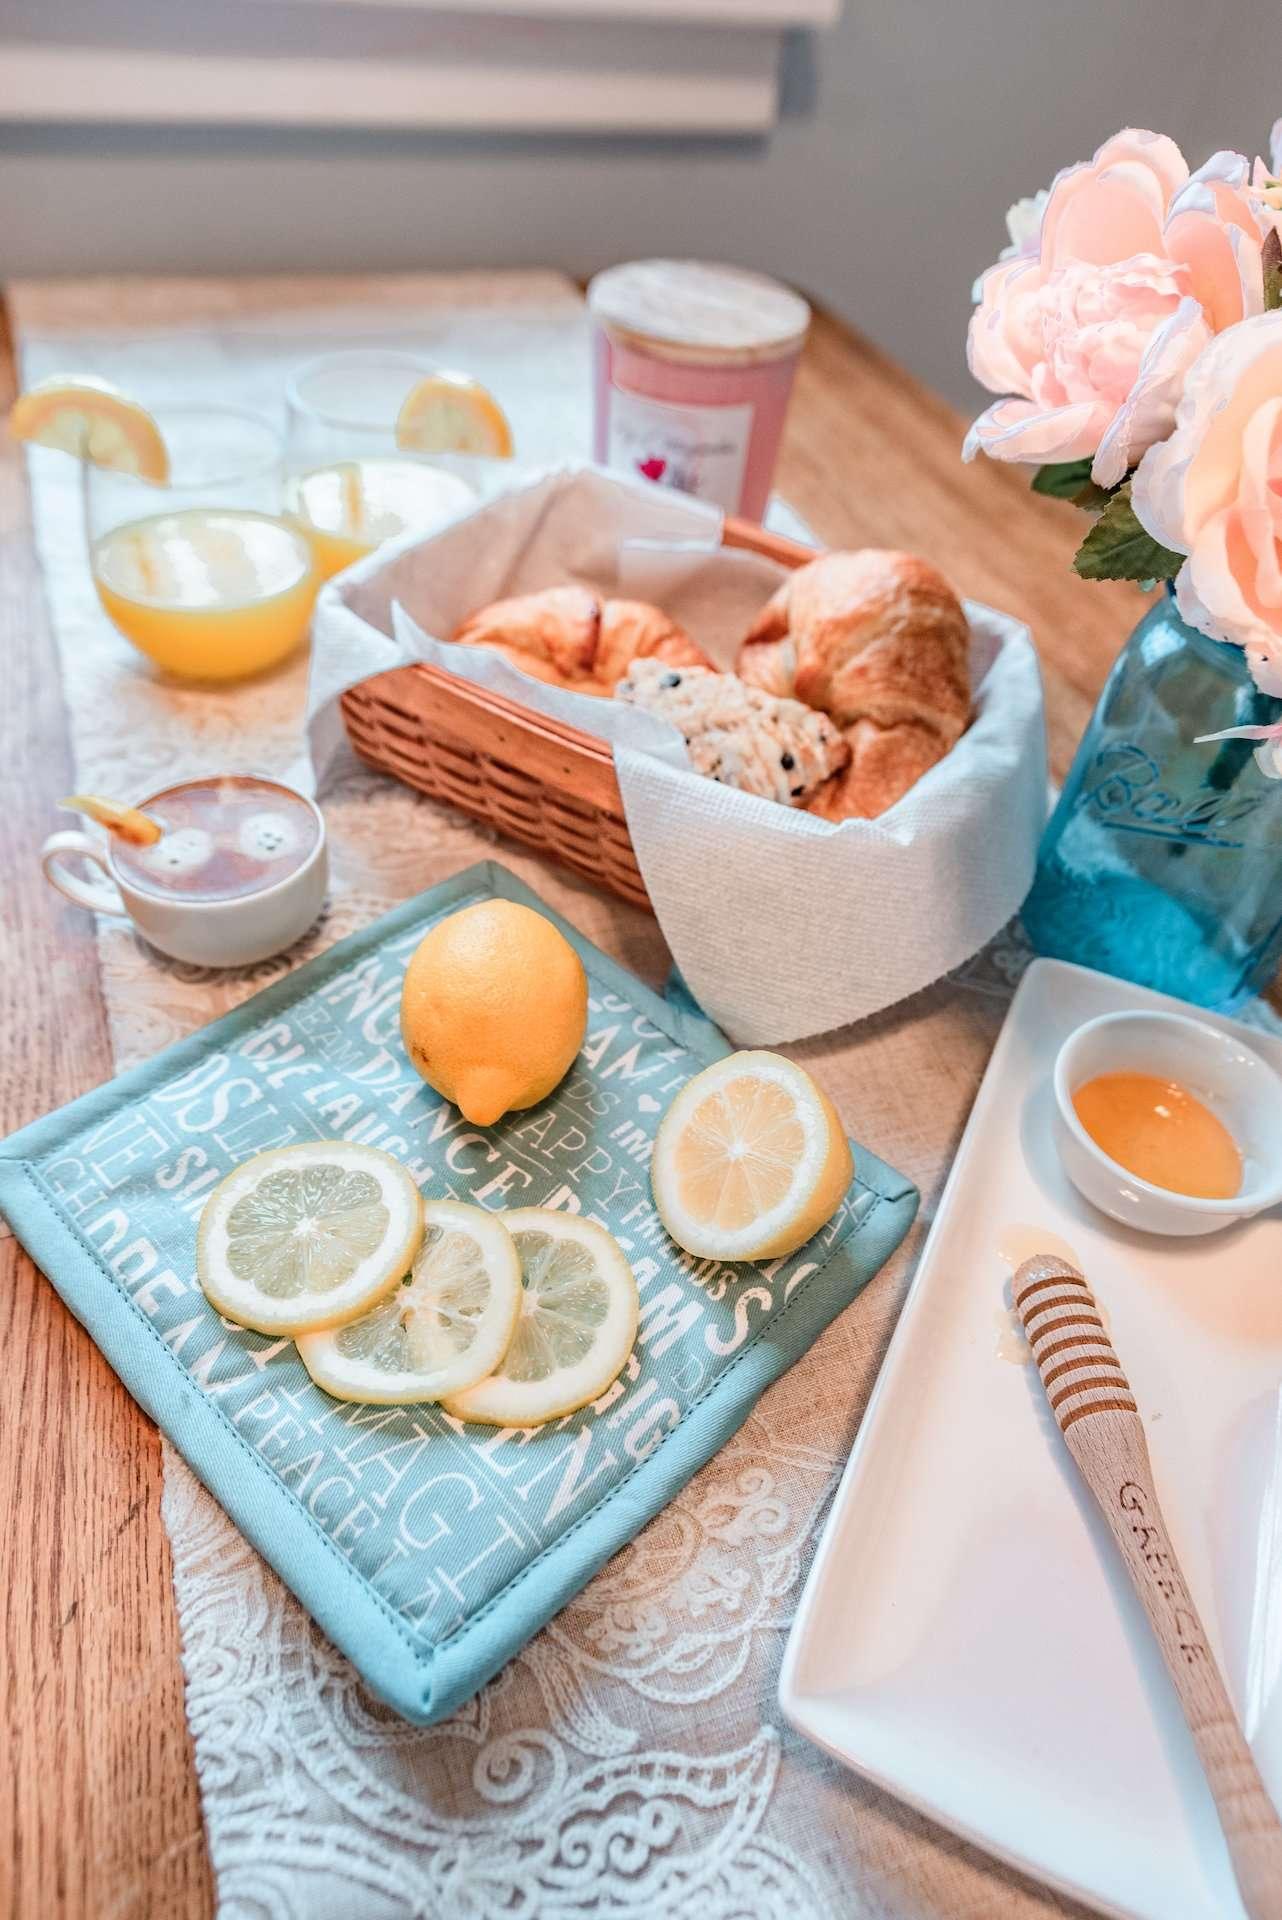 country kitchen breakfast spread